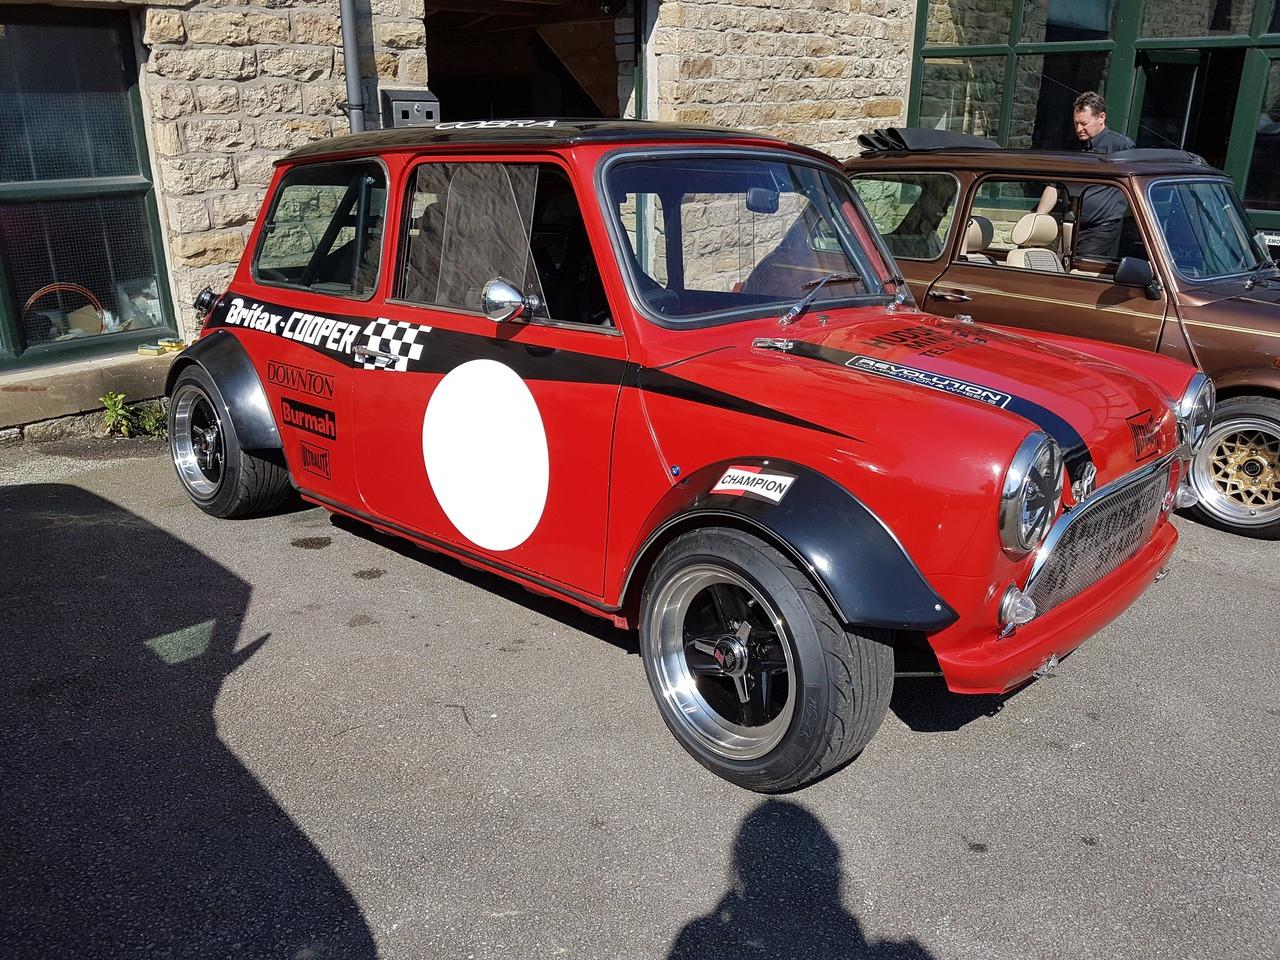 Red Bike Engine Classic Mini Huddersfield Spares Limited